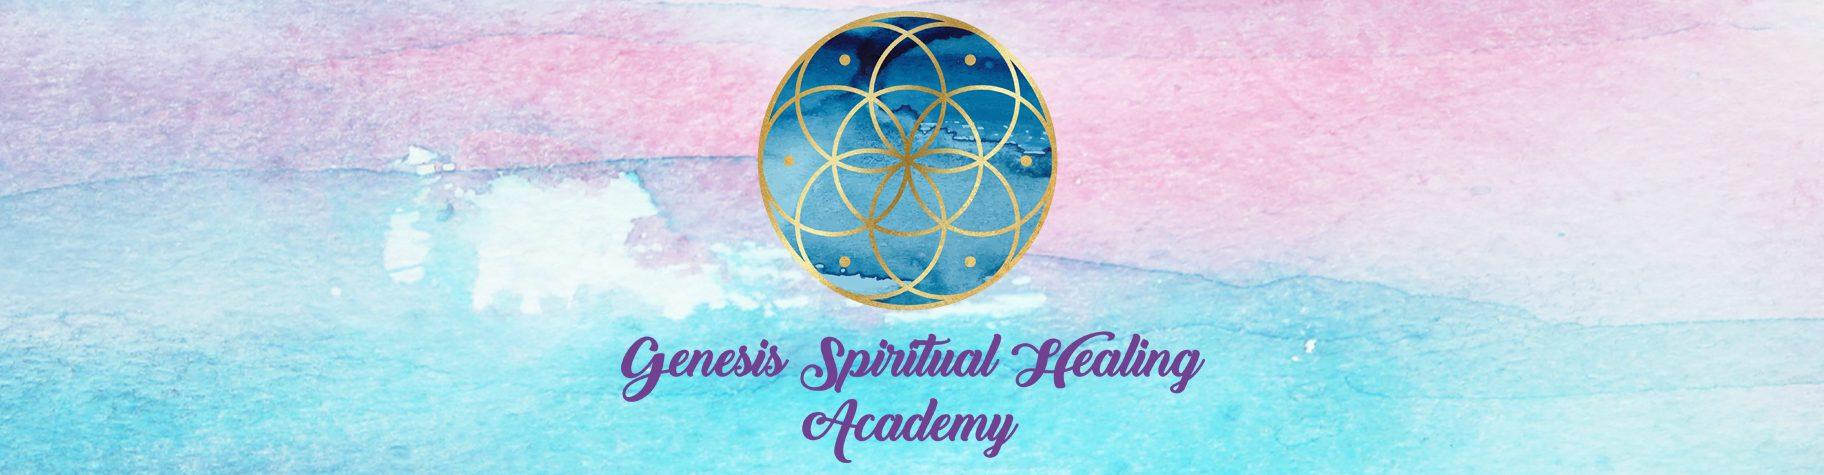 Genesis Spiritual Healing Academy